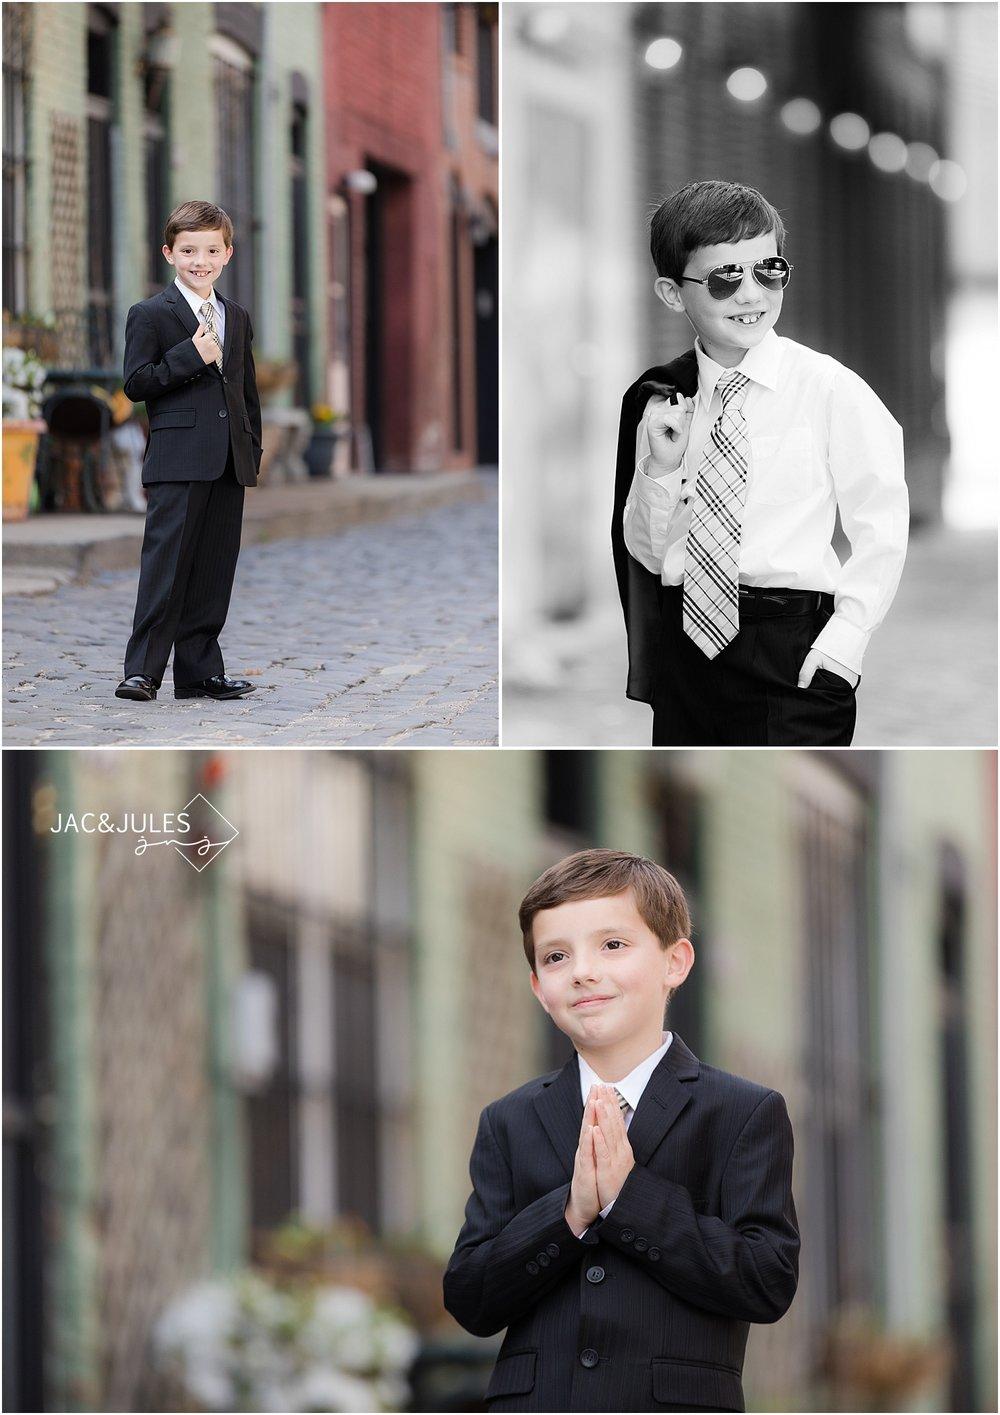 jacnjules photograph communion boy in Hoboken NJ